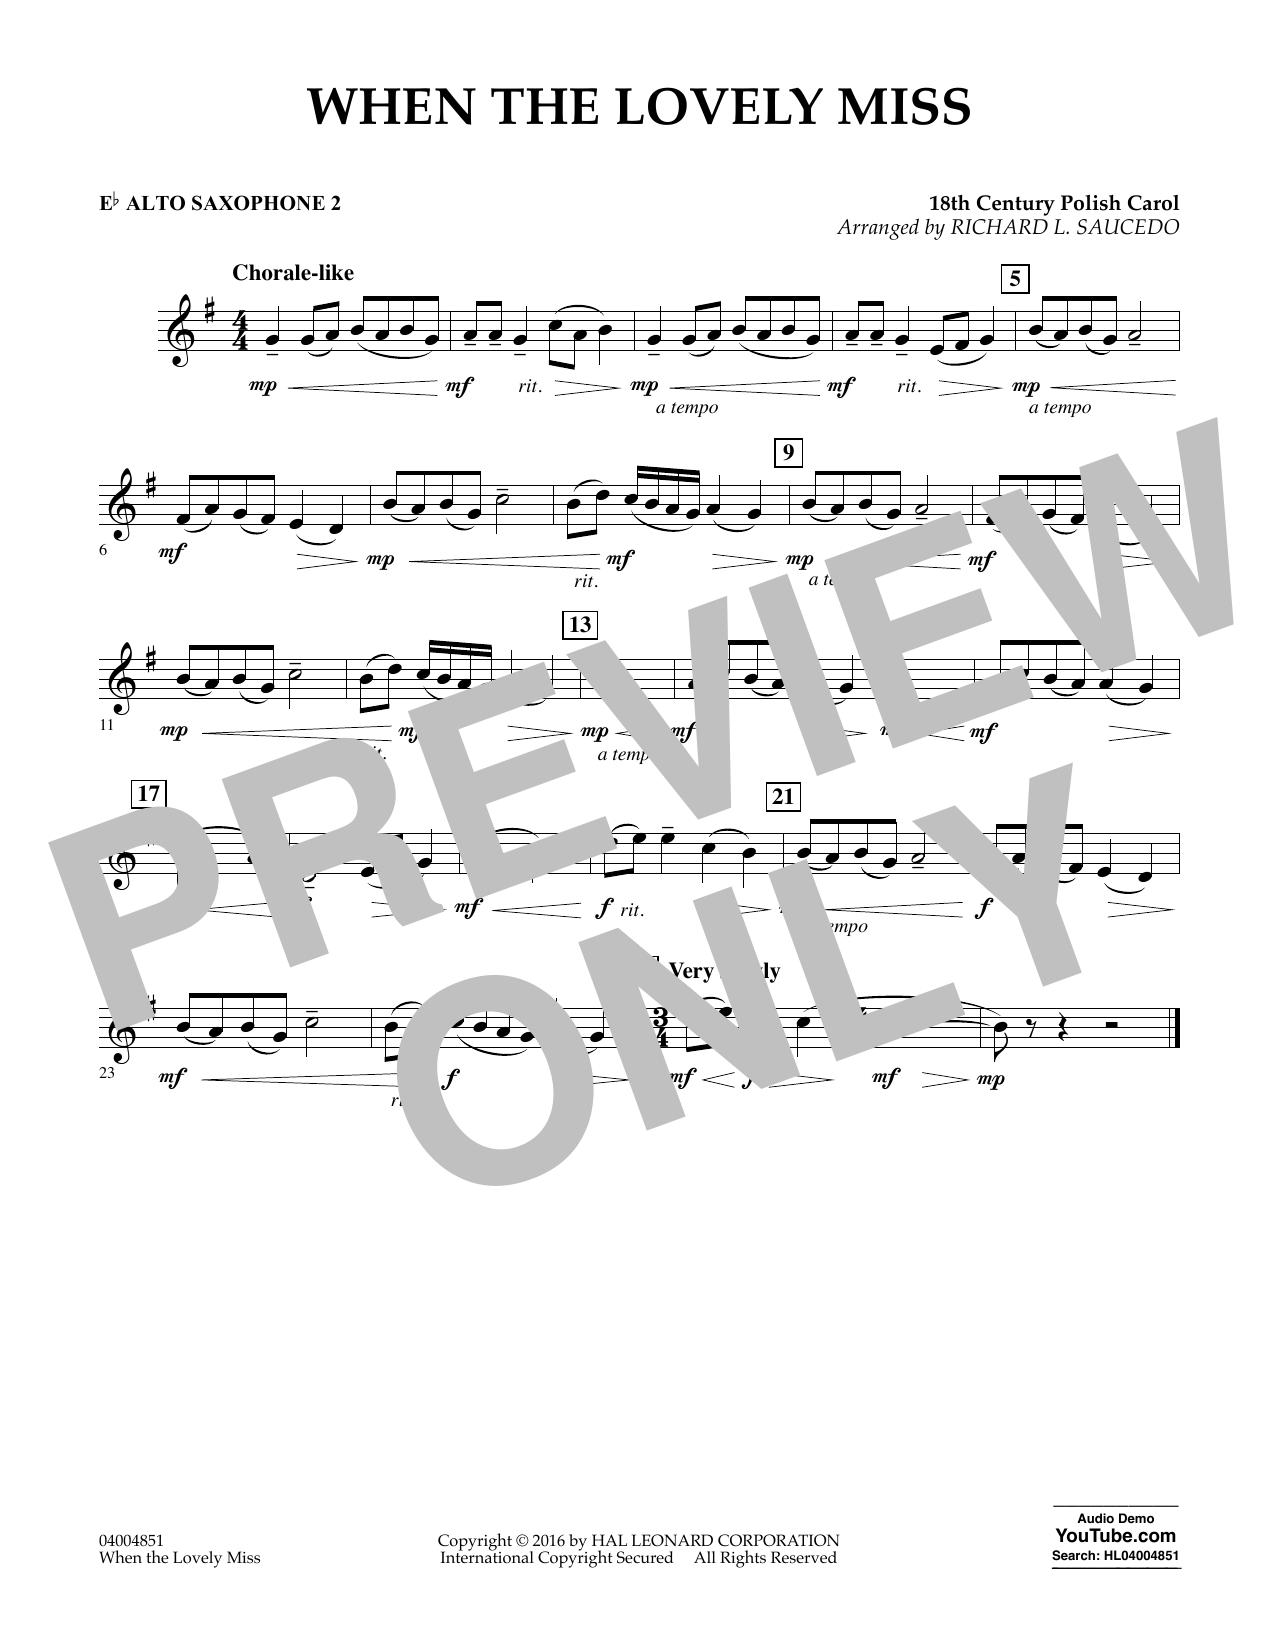 When the Lovely Miss (18th Century Polish Carol) - Eb Alto Saxophone 2 (Concert Band)